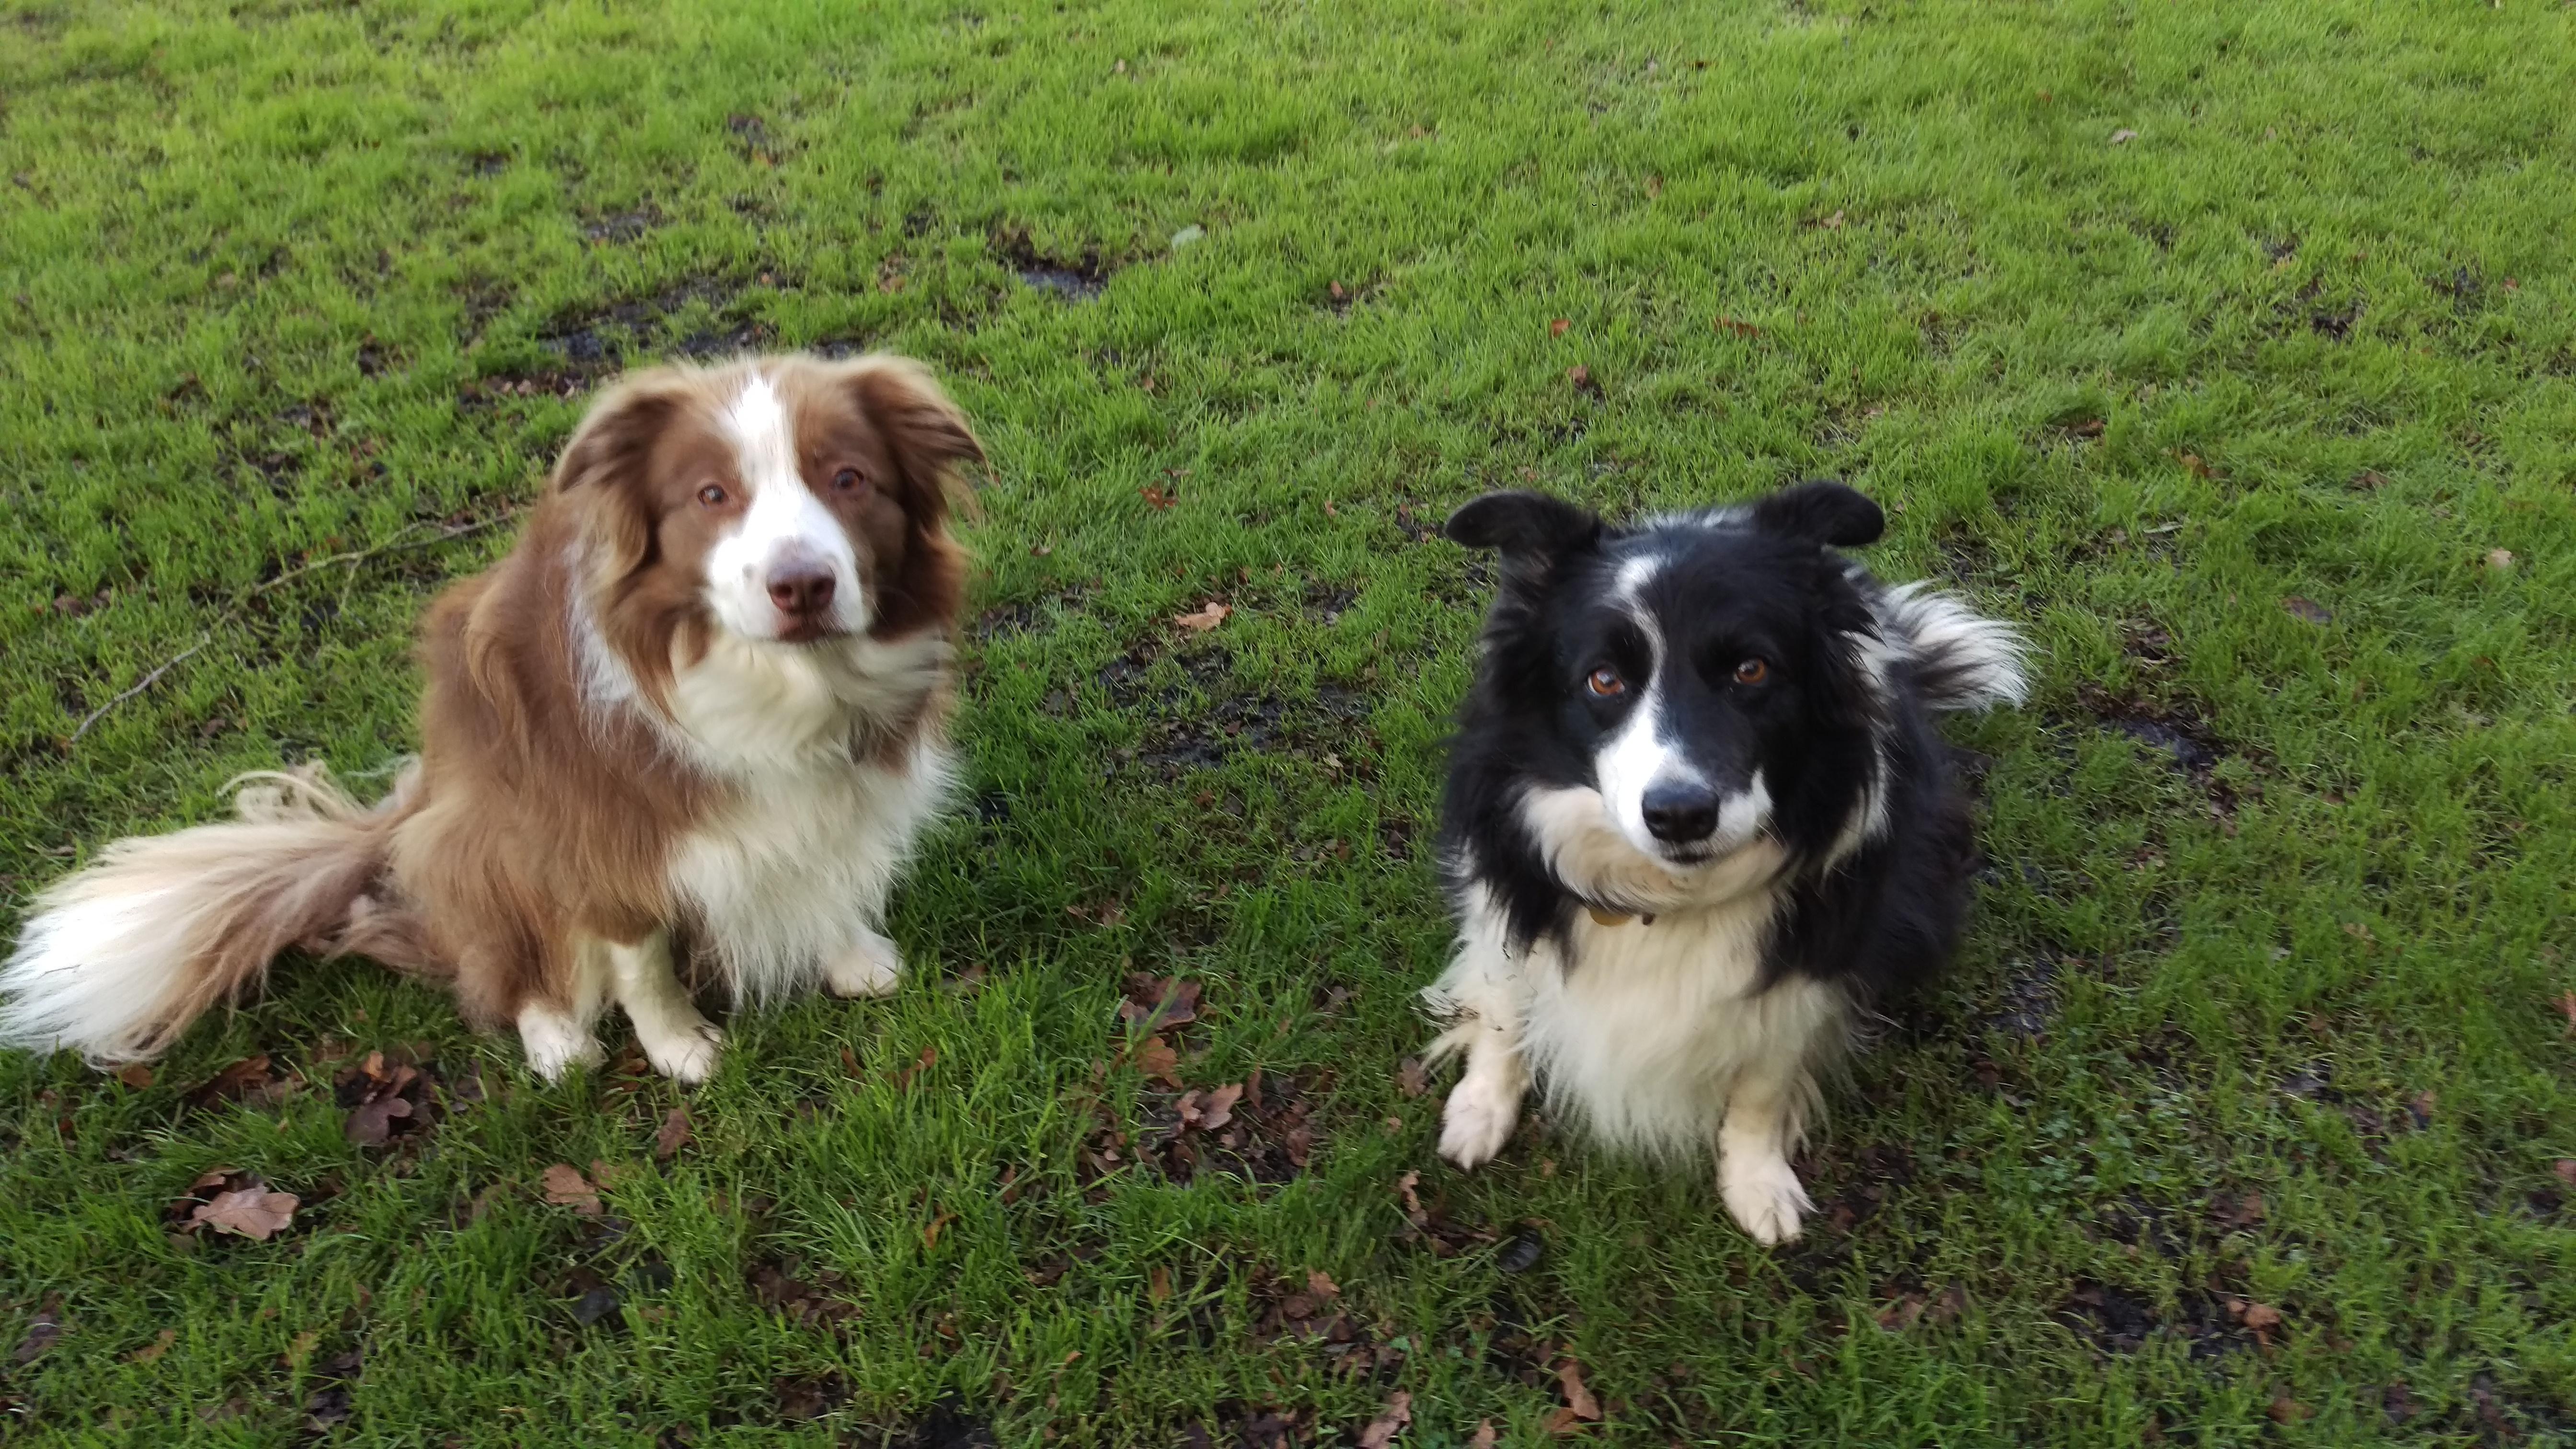 Cloverleigh Dog Boarding Kennels Dog Training Ely England